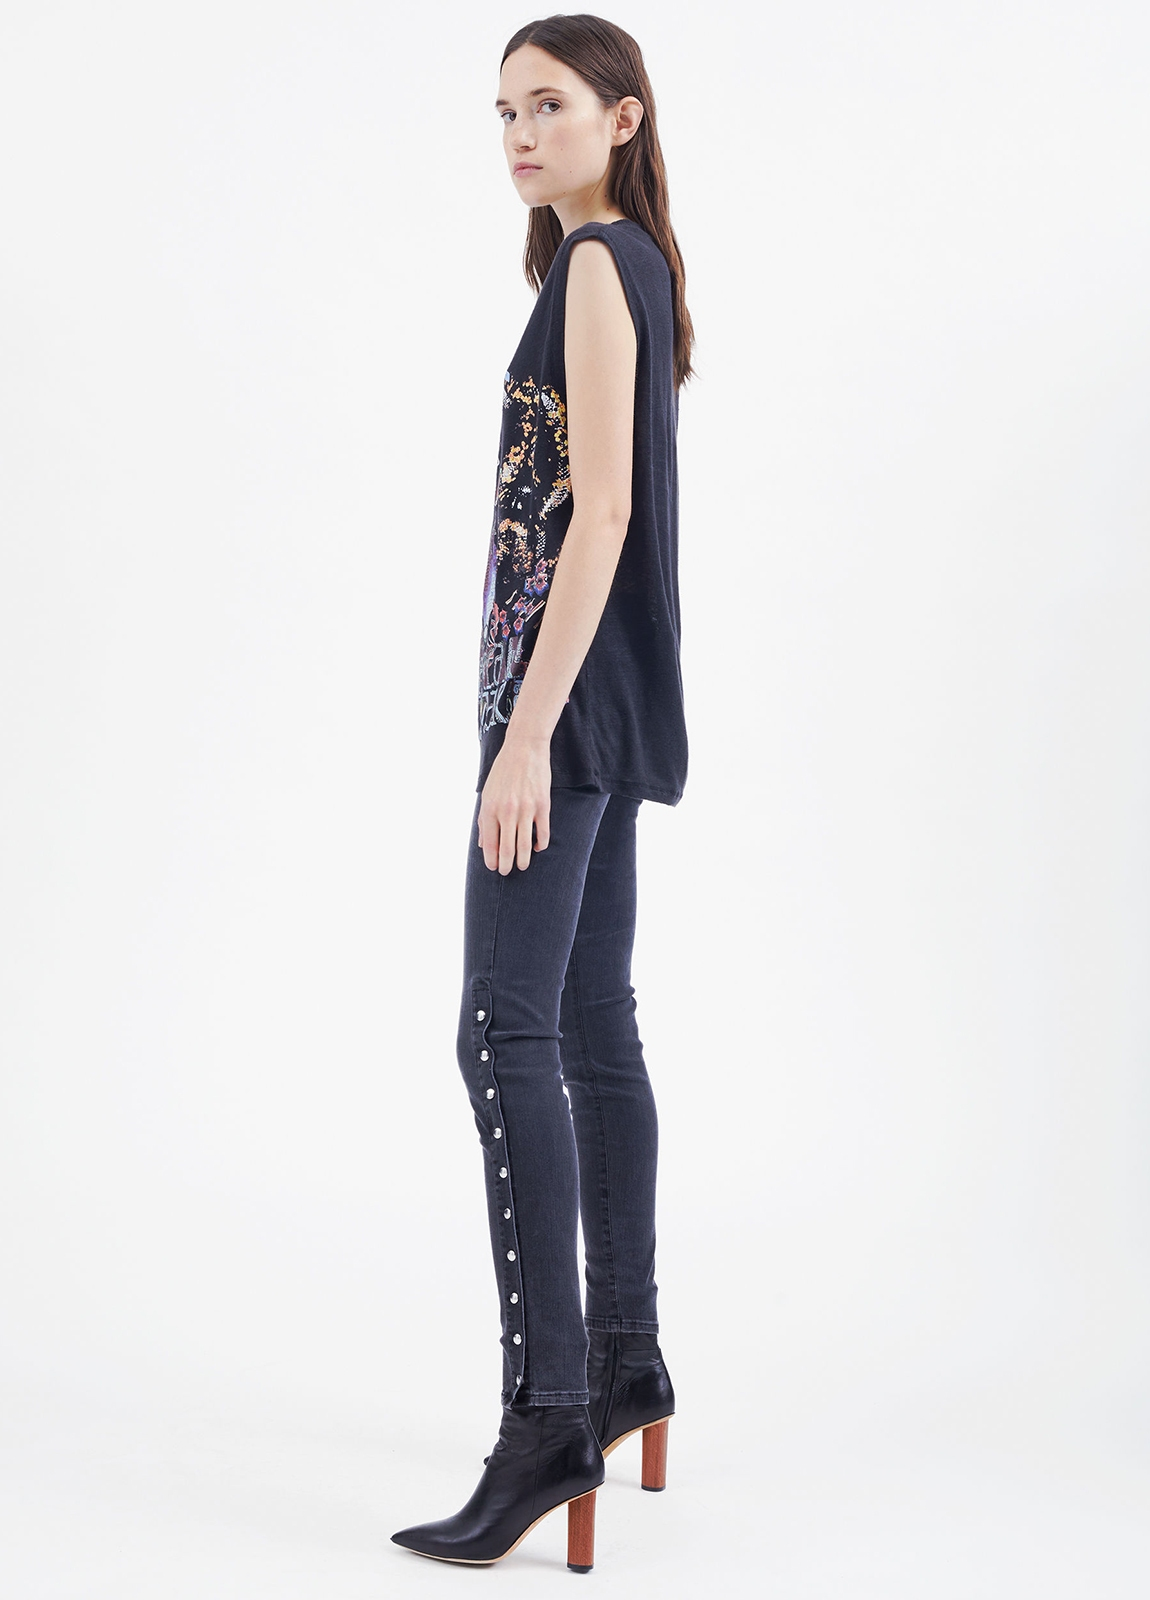 Camiseta woman sin mangas color negro con dibujo frontal. 100% Lino. - Ítem1